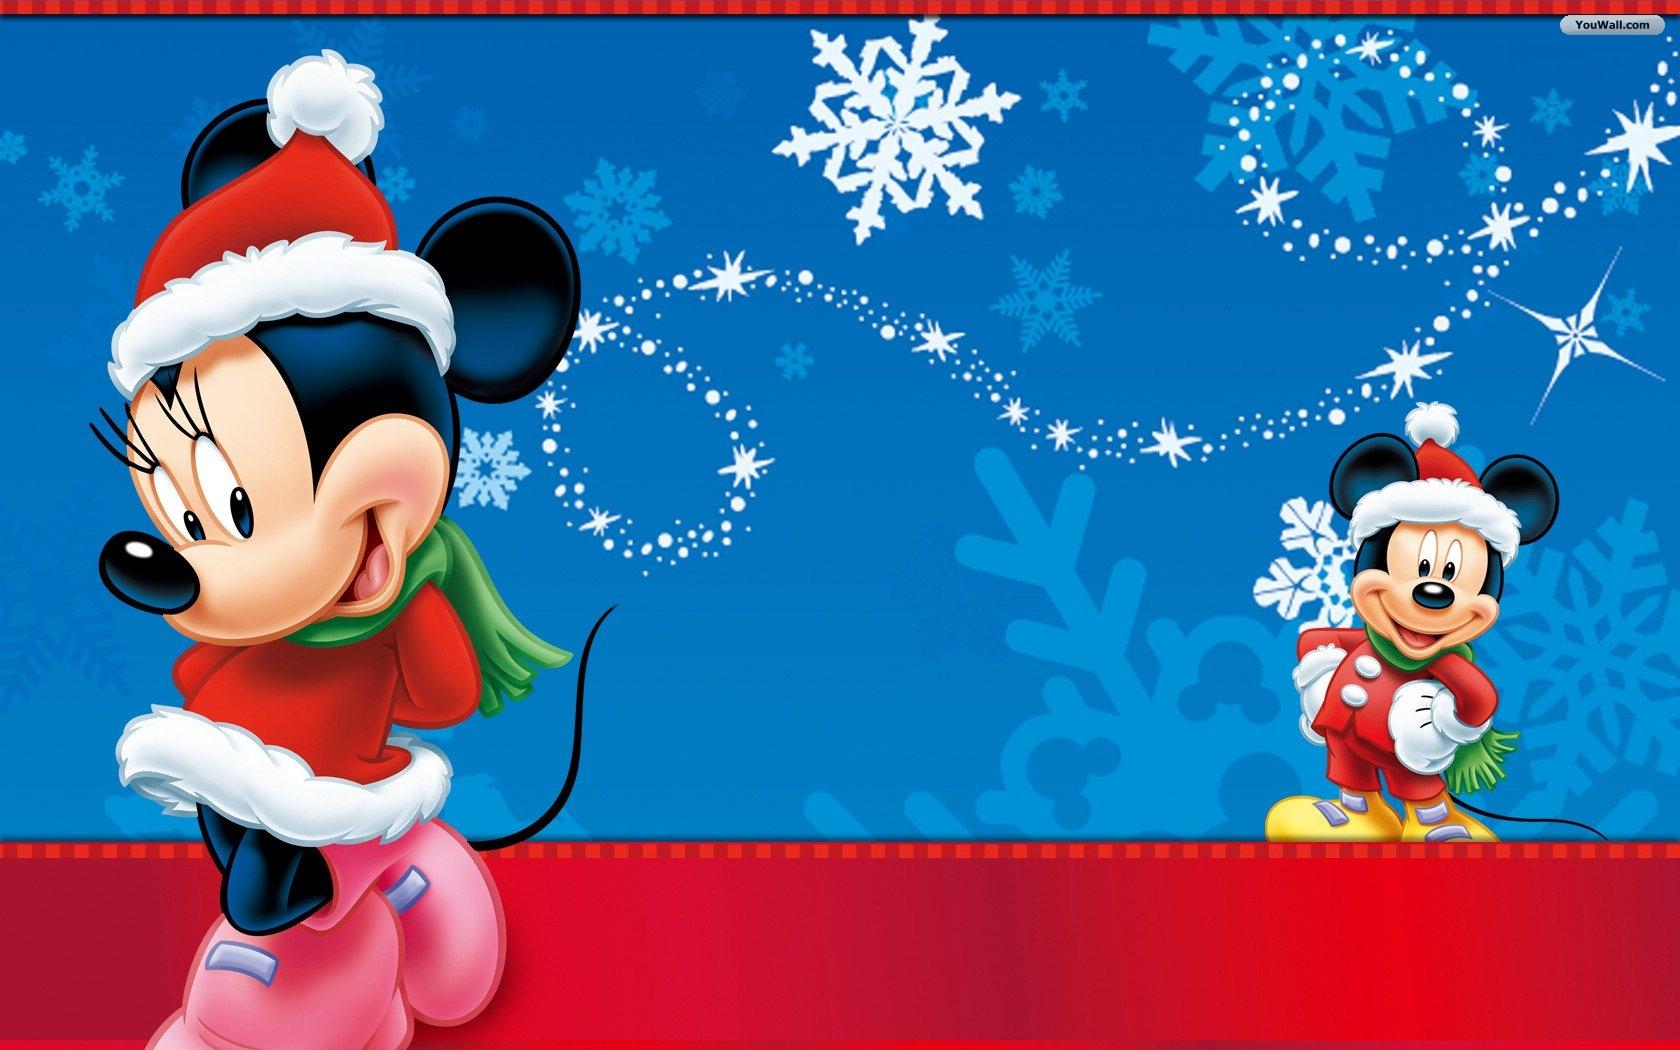 Christmas Mickey Mouse Wallpaper